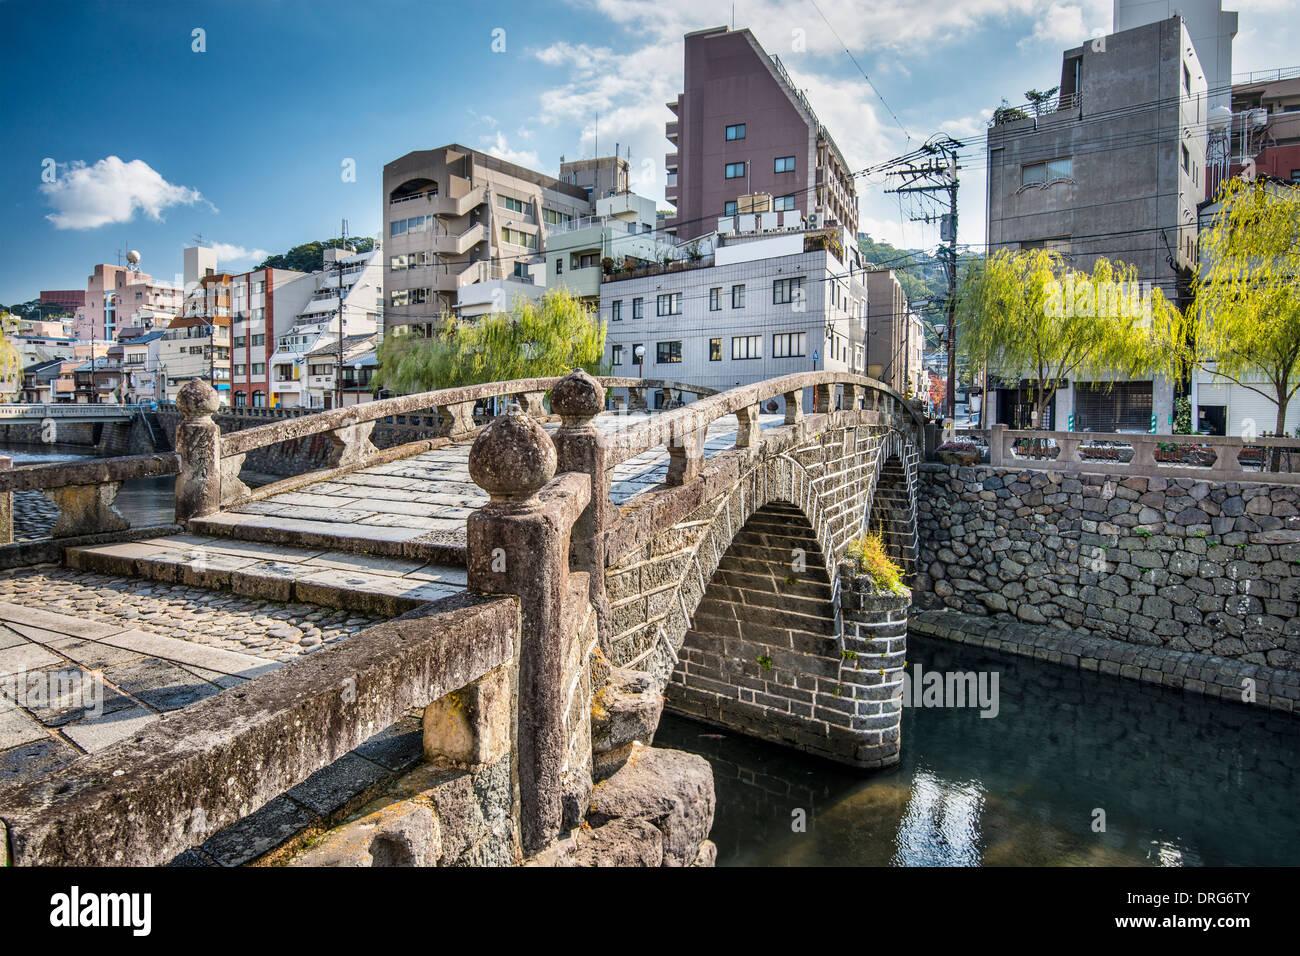 Nagasaki, Japan at historic Megane 'Spectacles Bridge' over the Nakashima River. - Stock Image